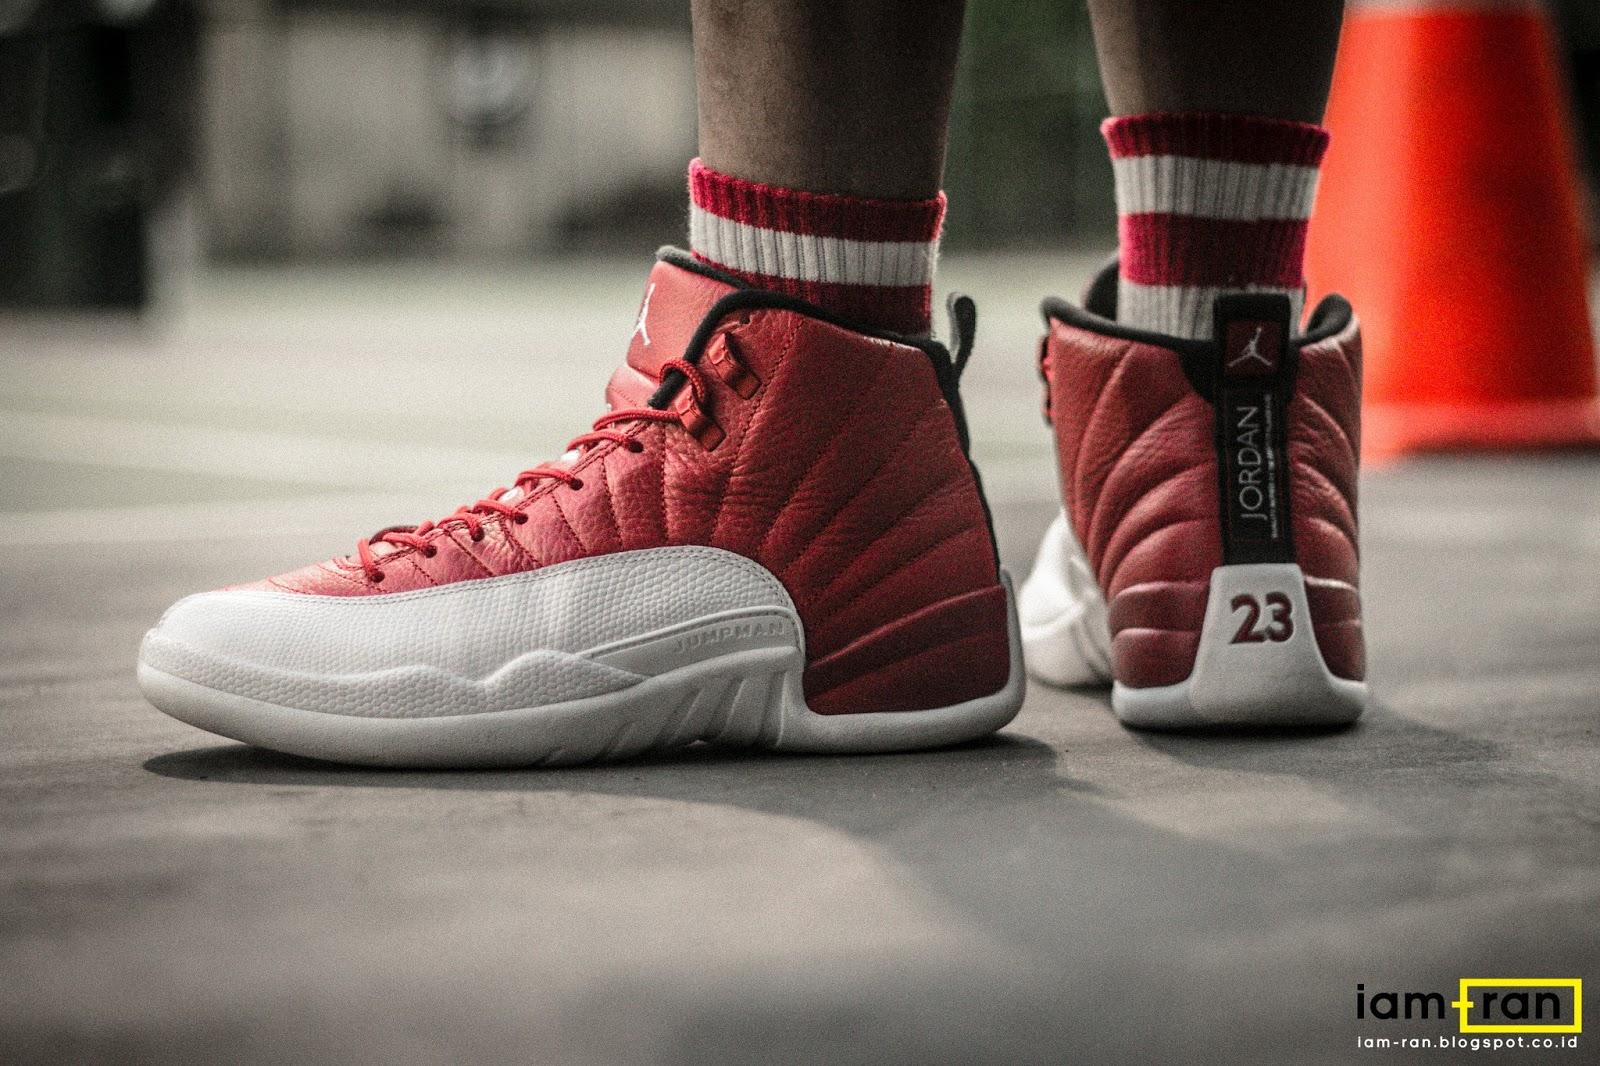 d9740a1678ea82 IAM-RAN  ON FEET   Rhyme on - Nike Air Jordan 12